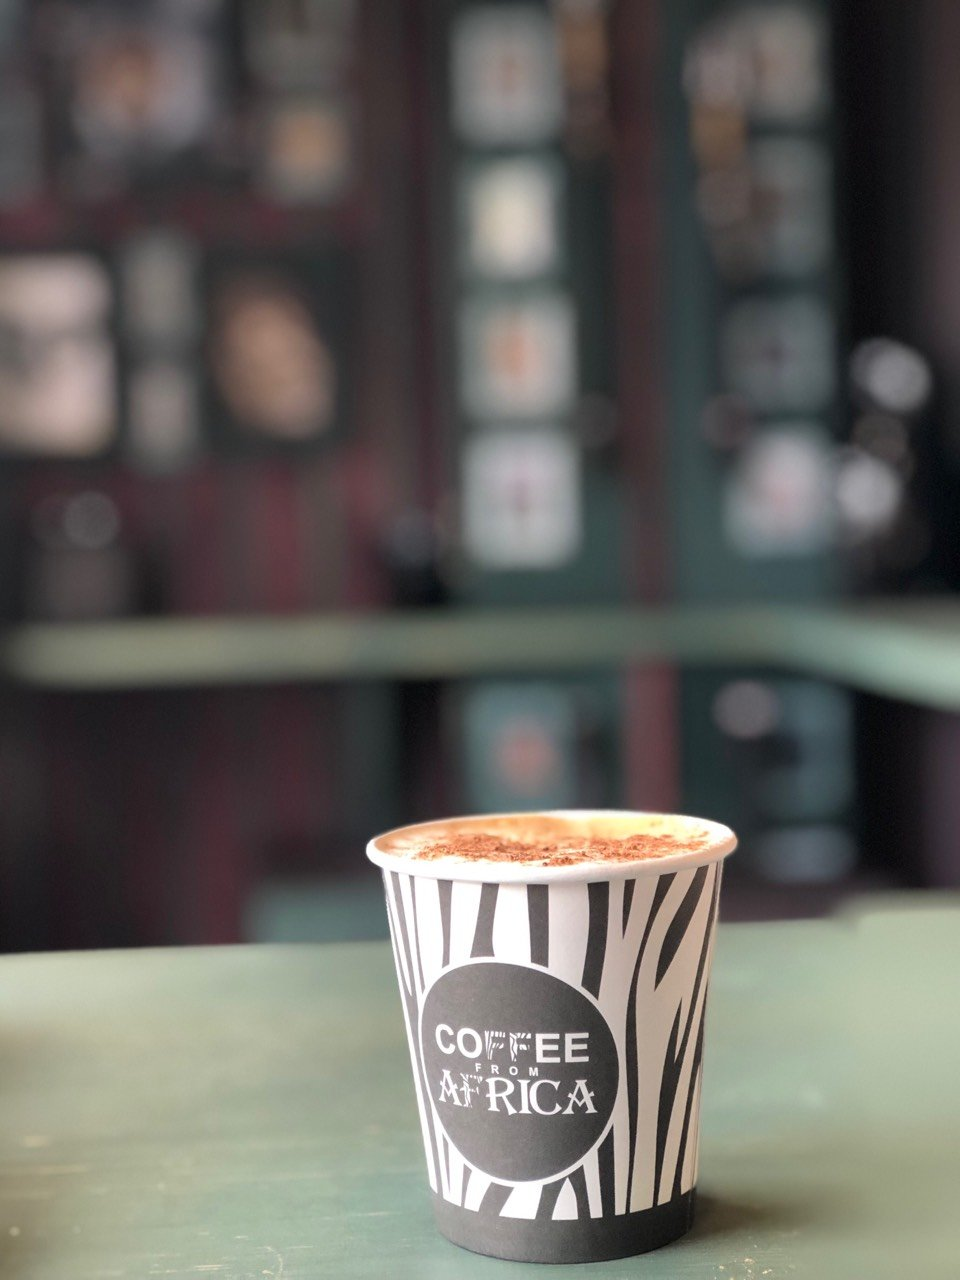 Кохання з присмаком кави: де у Хмельницькому провести День закоханих, фото-6